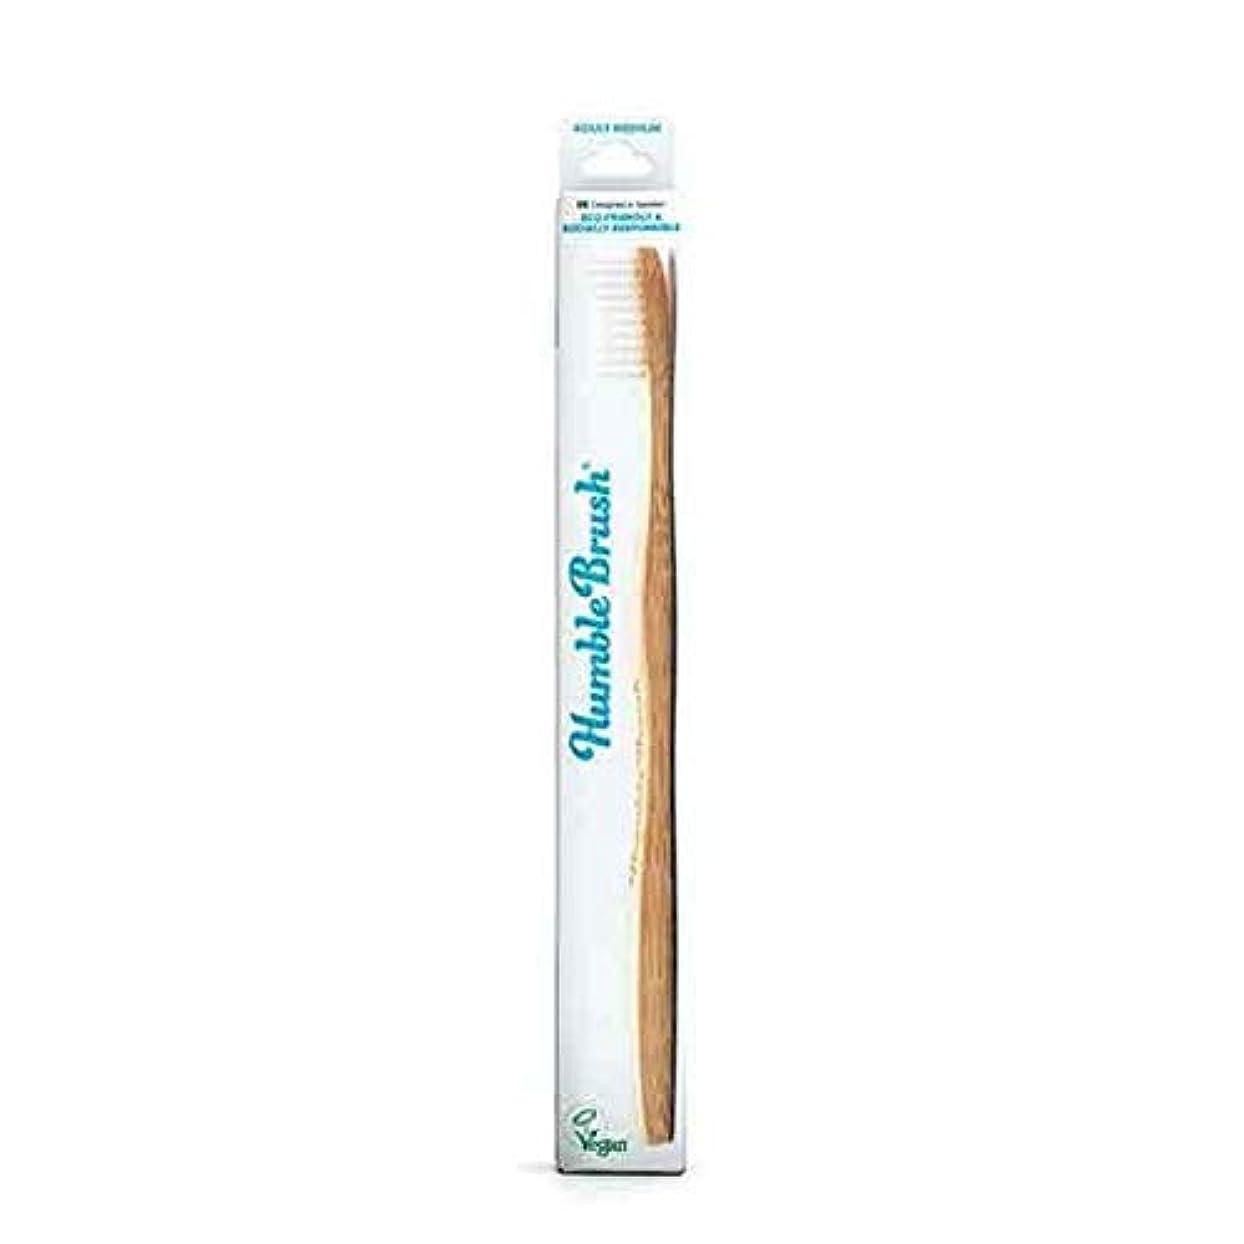 [The Humble Co ] 謙虚なブラシ大人竹の歯ブラシ白 - Humble Brush Adults Bamboo Toothbrush White [並行輸入品]